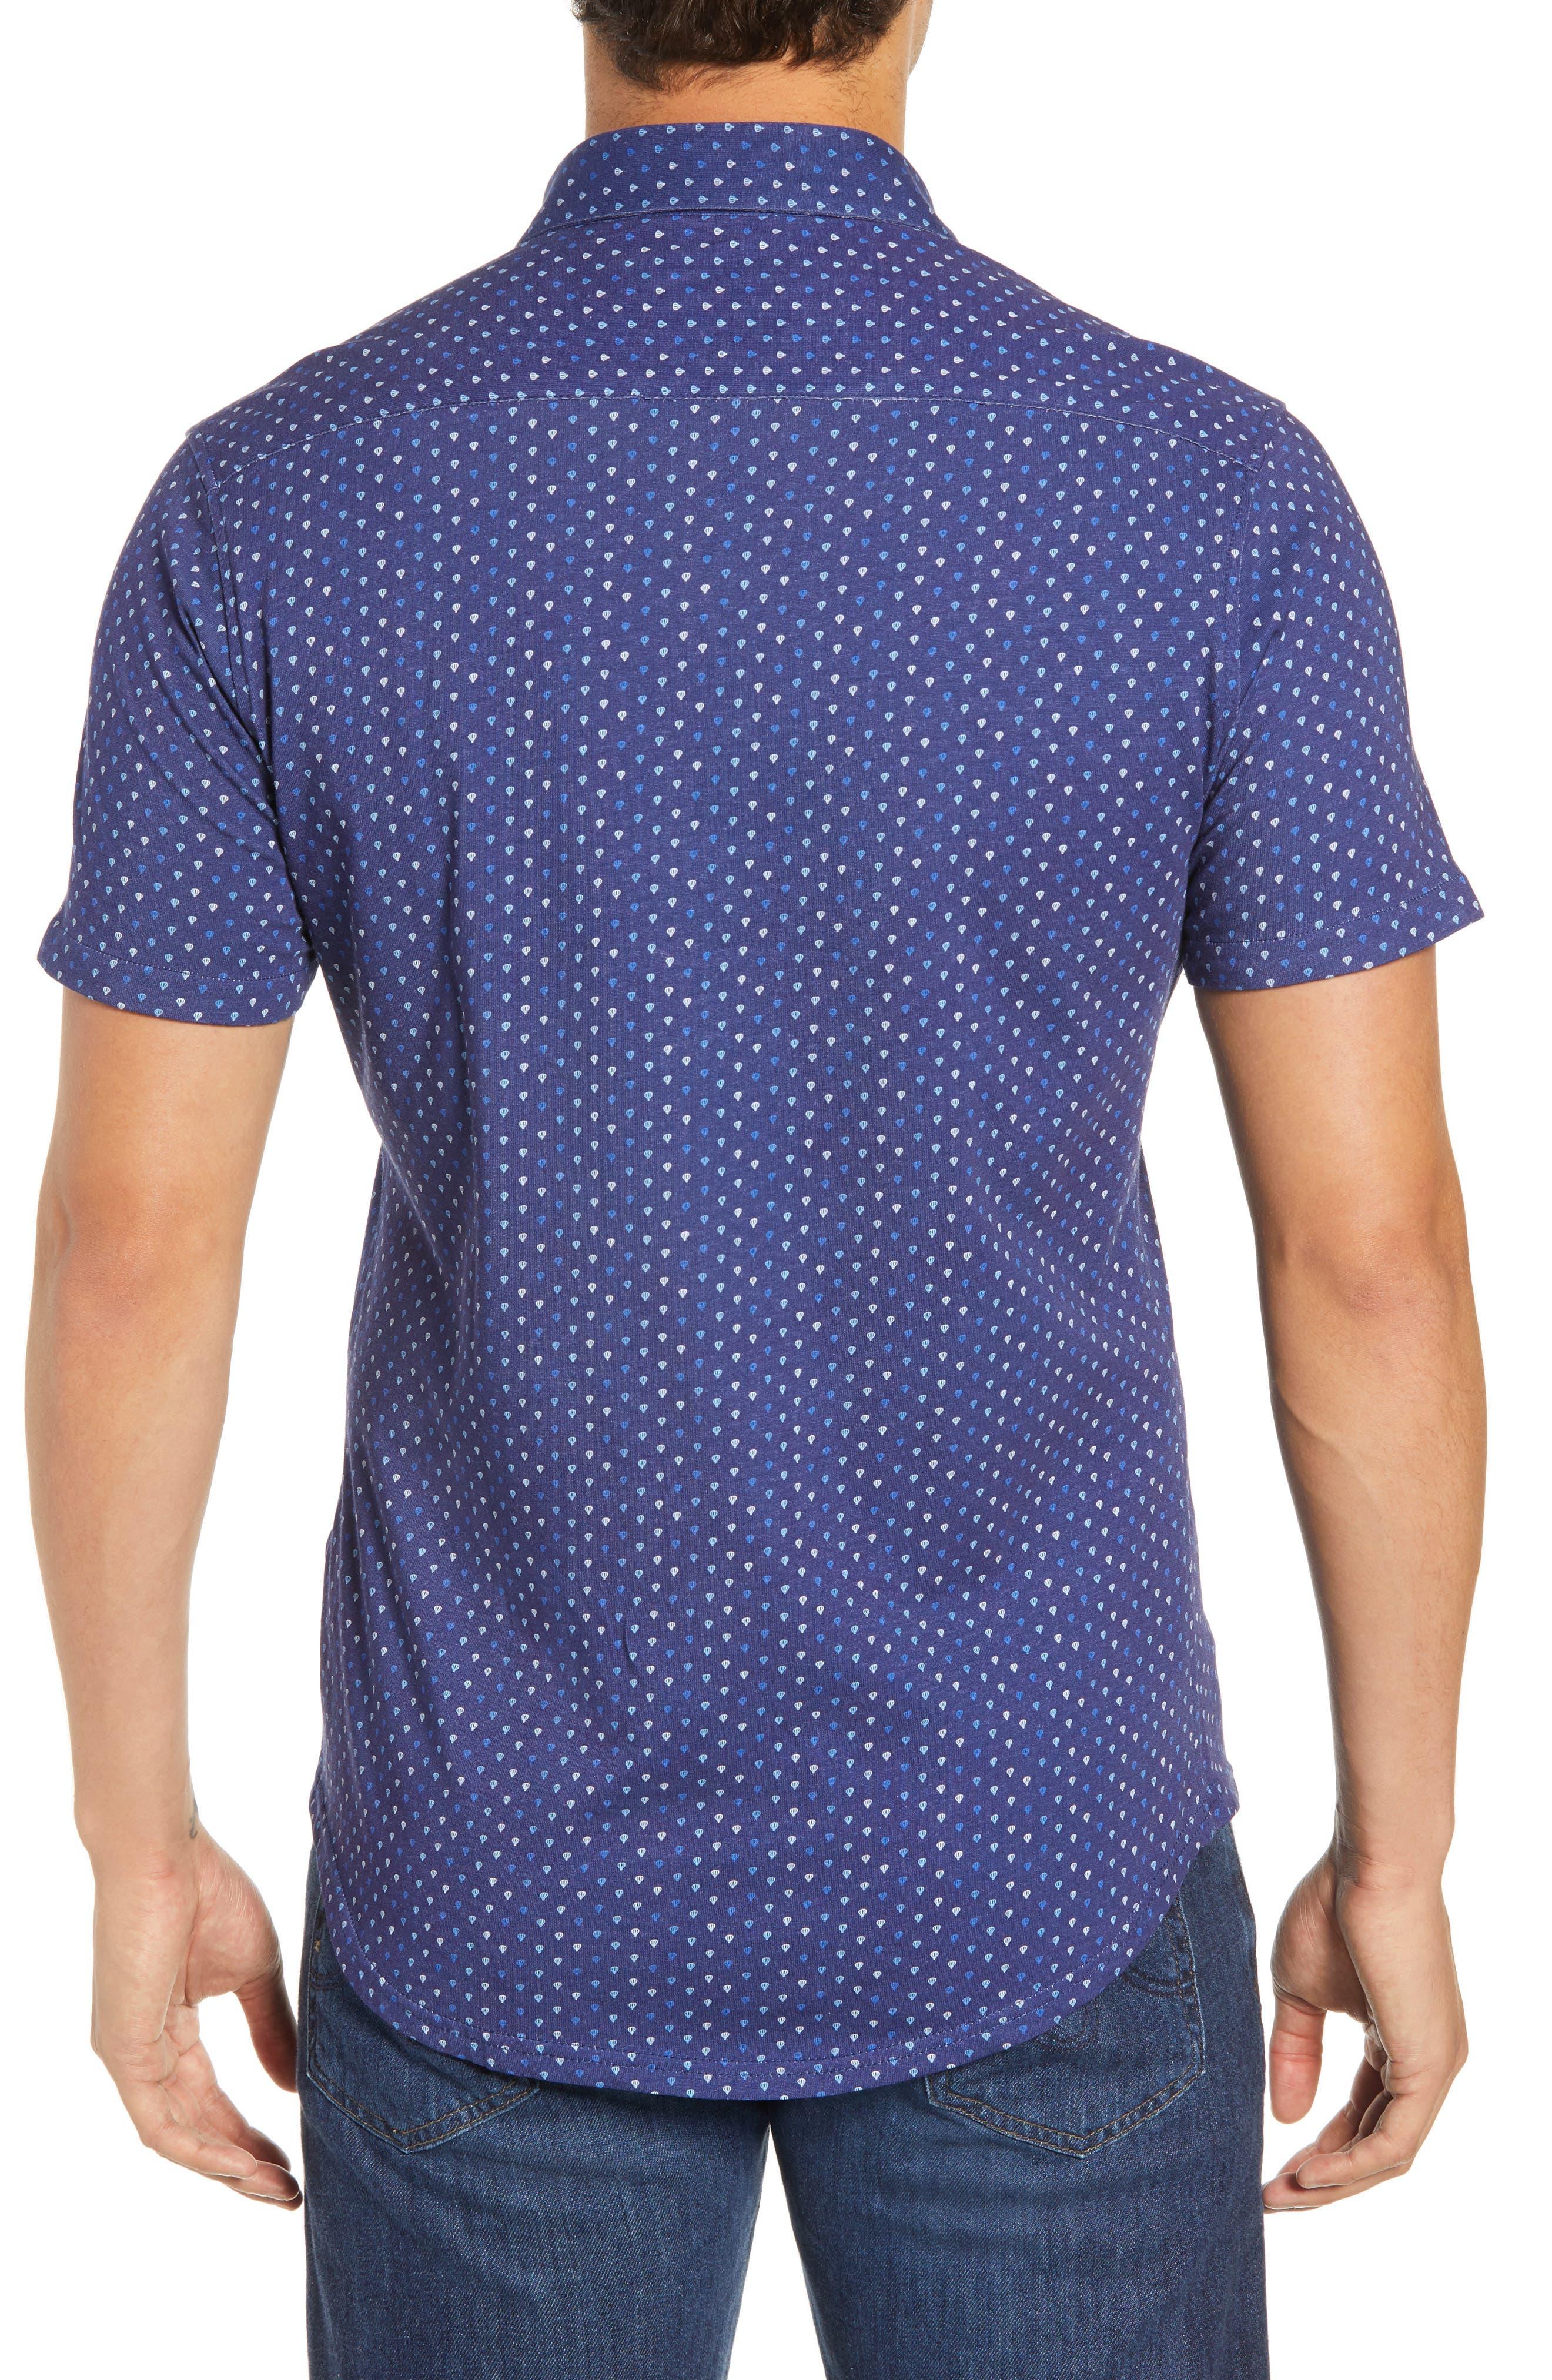 Regular Fit Sport Shirt,                             Alternate thumbnail 3, color,                             NAVY